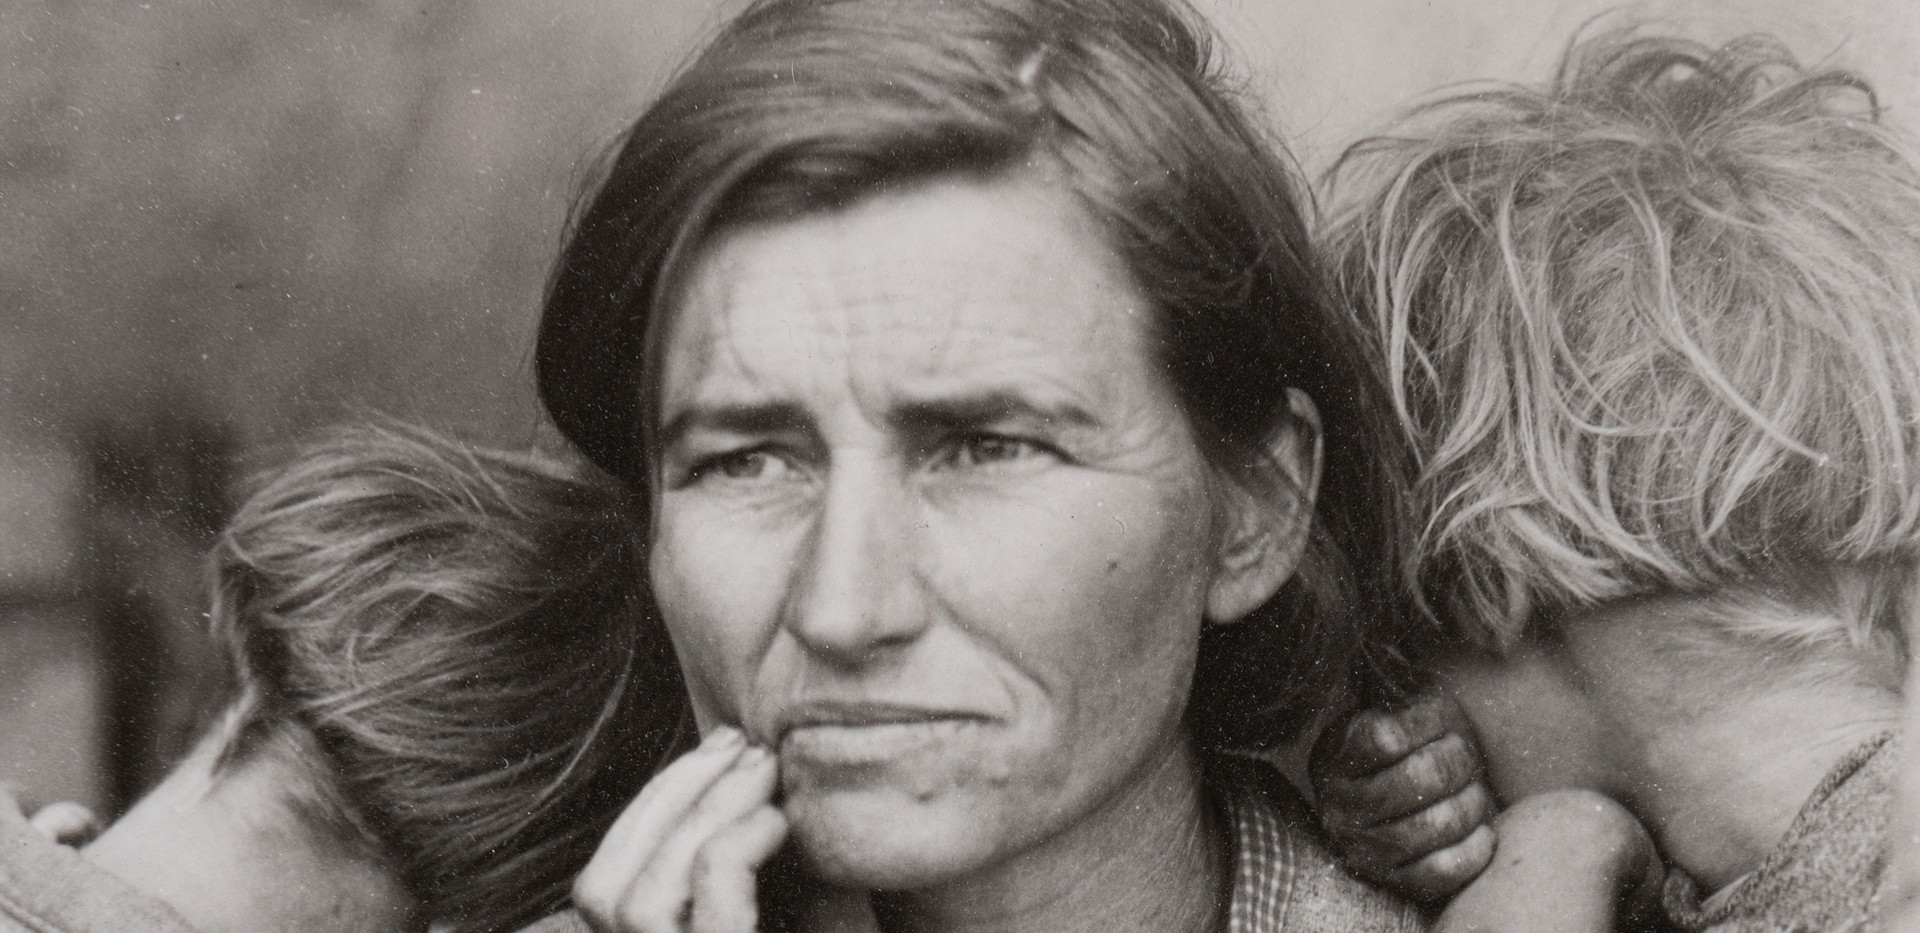 DOROTHEA LANGE (AMERICAN 1895 - 1965) Migrant Mother, Nipomo, California, 1936